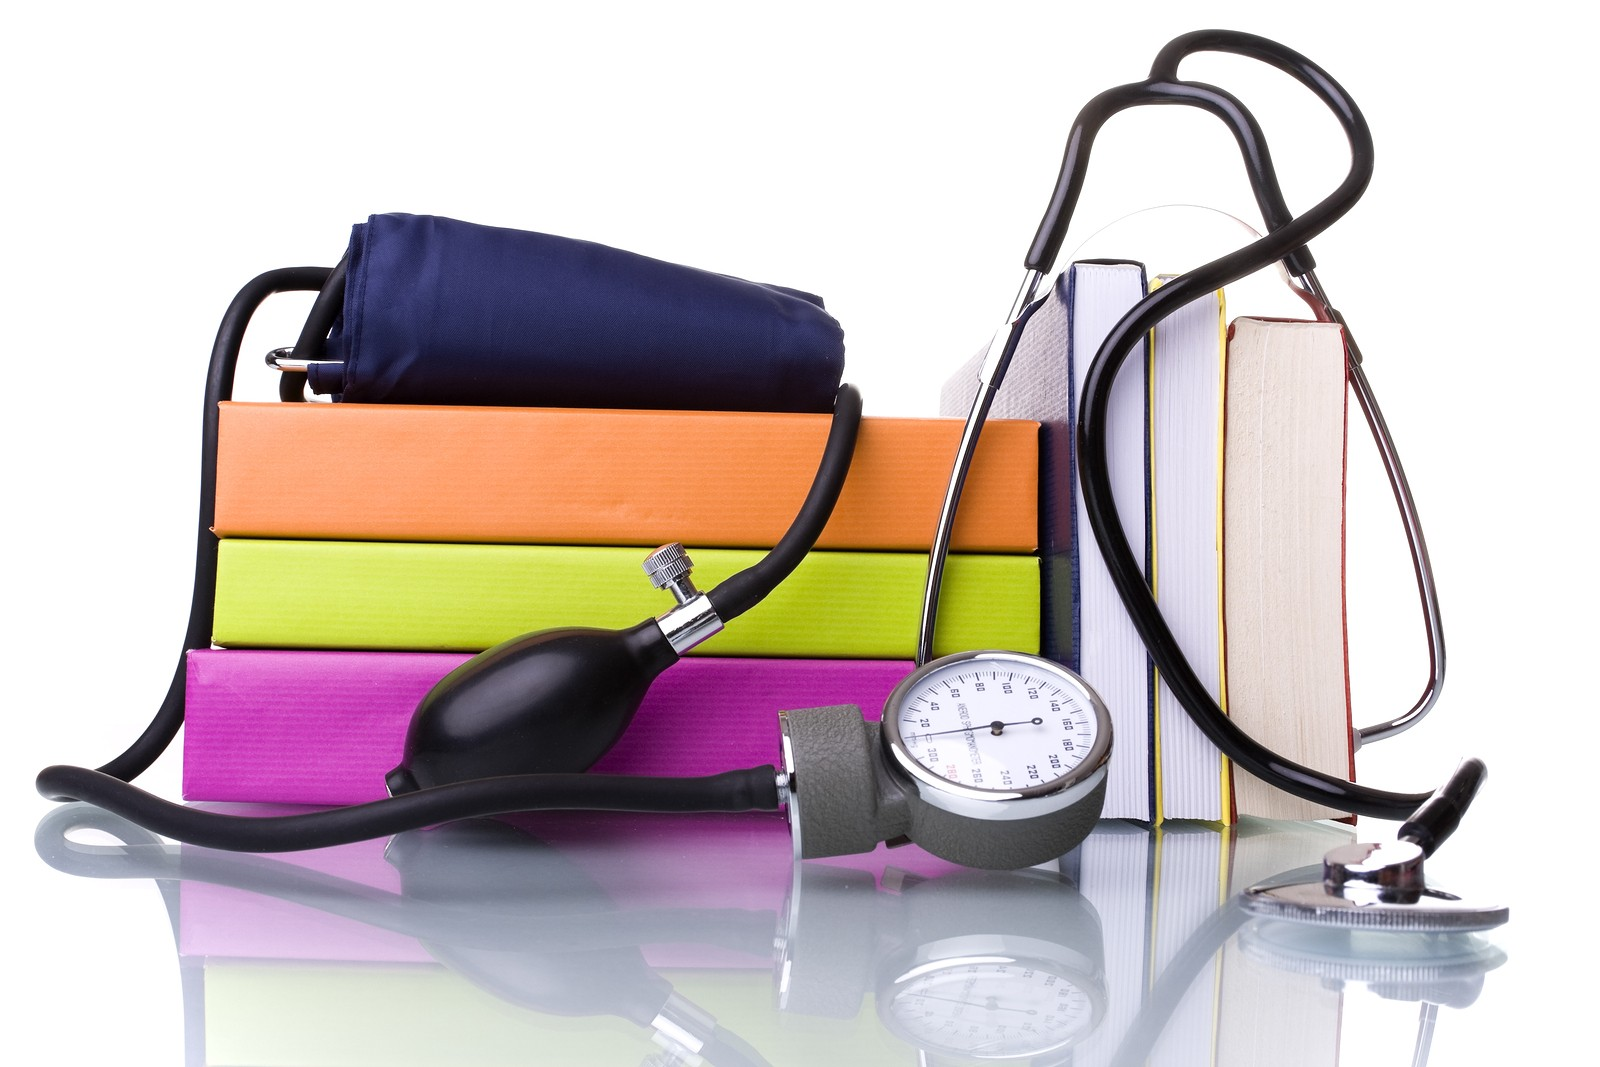 bigstock-Medical-School-4481898